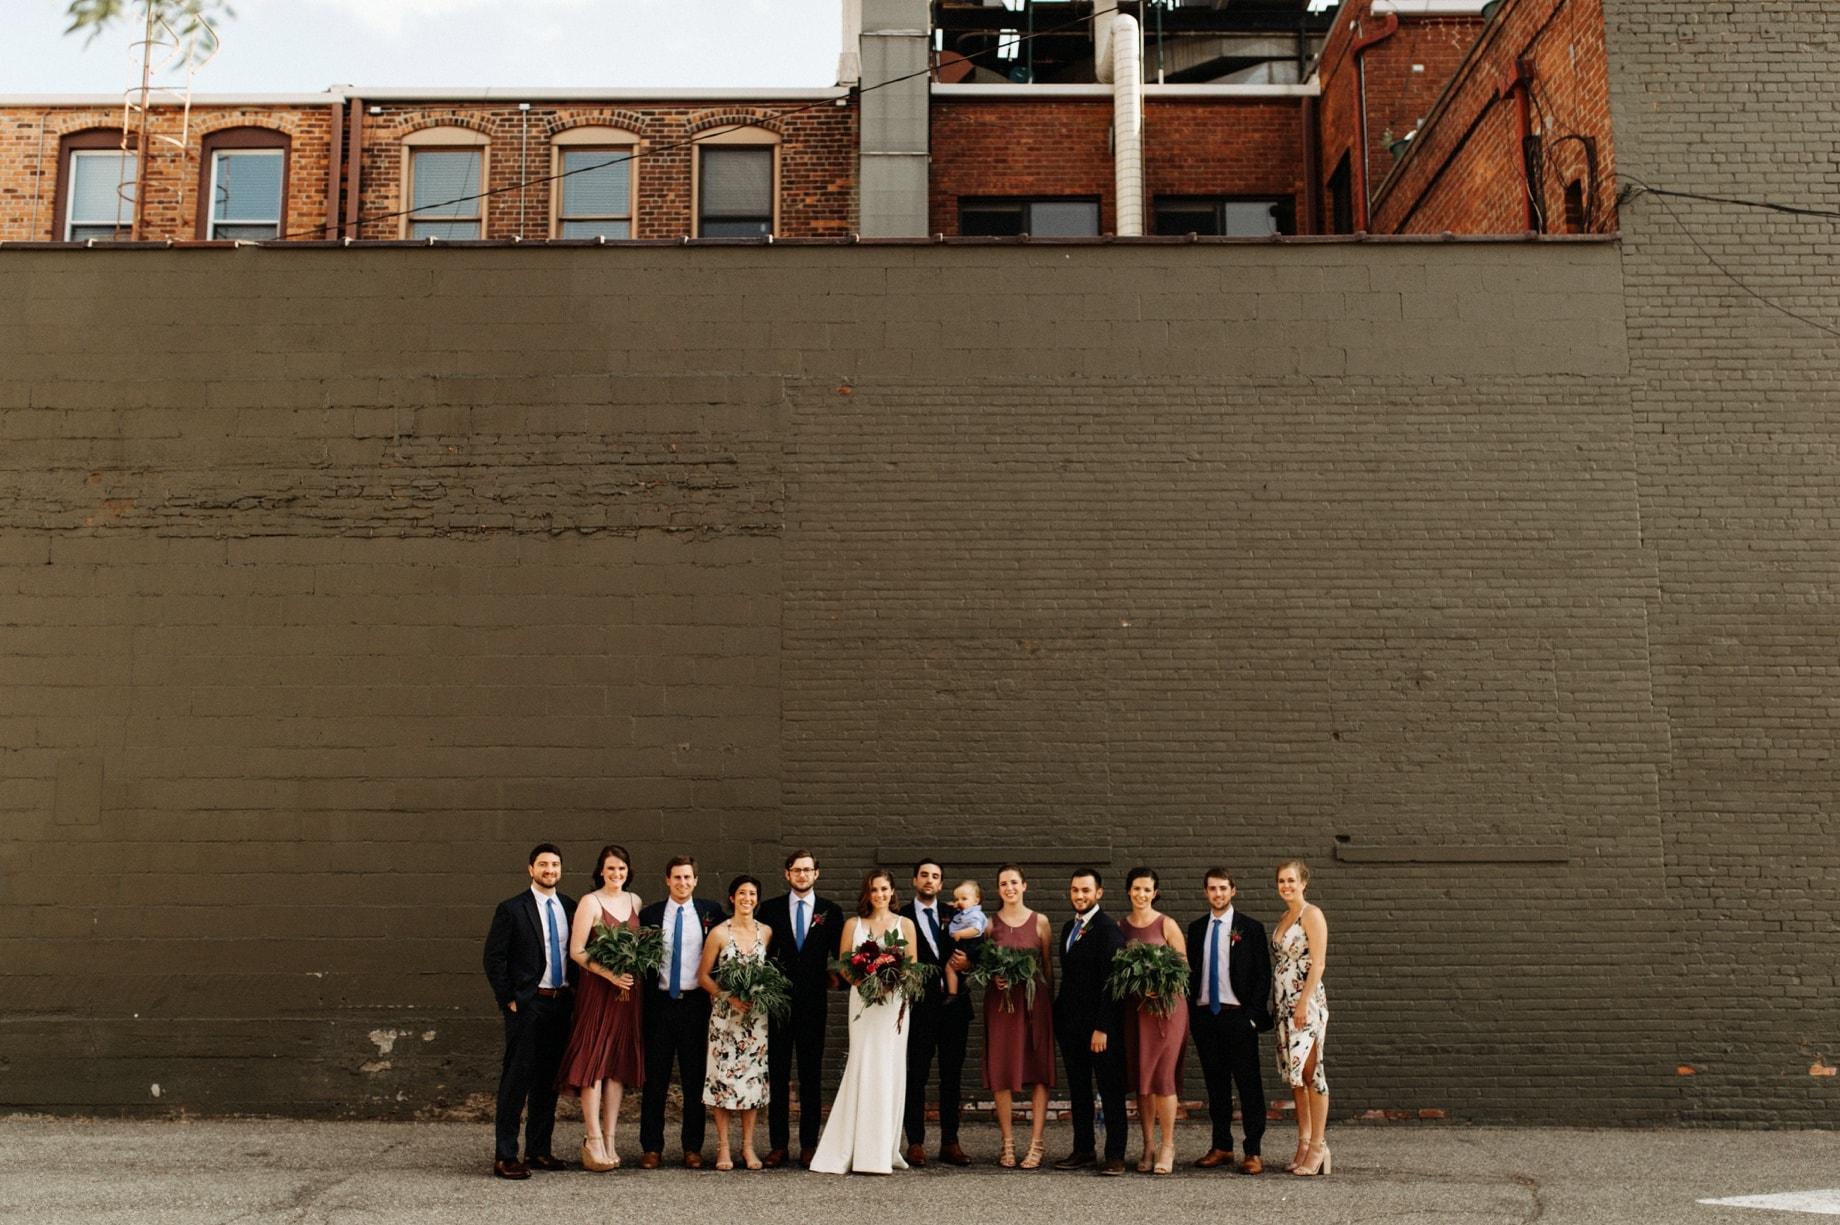 wedding party in Aritzia dresses